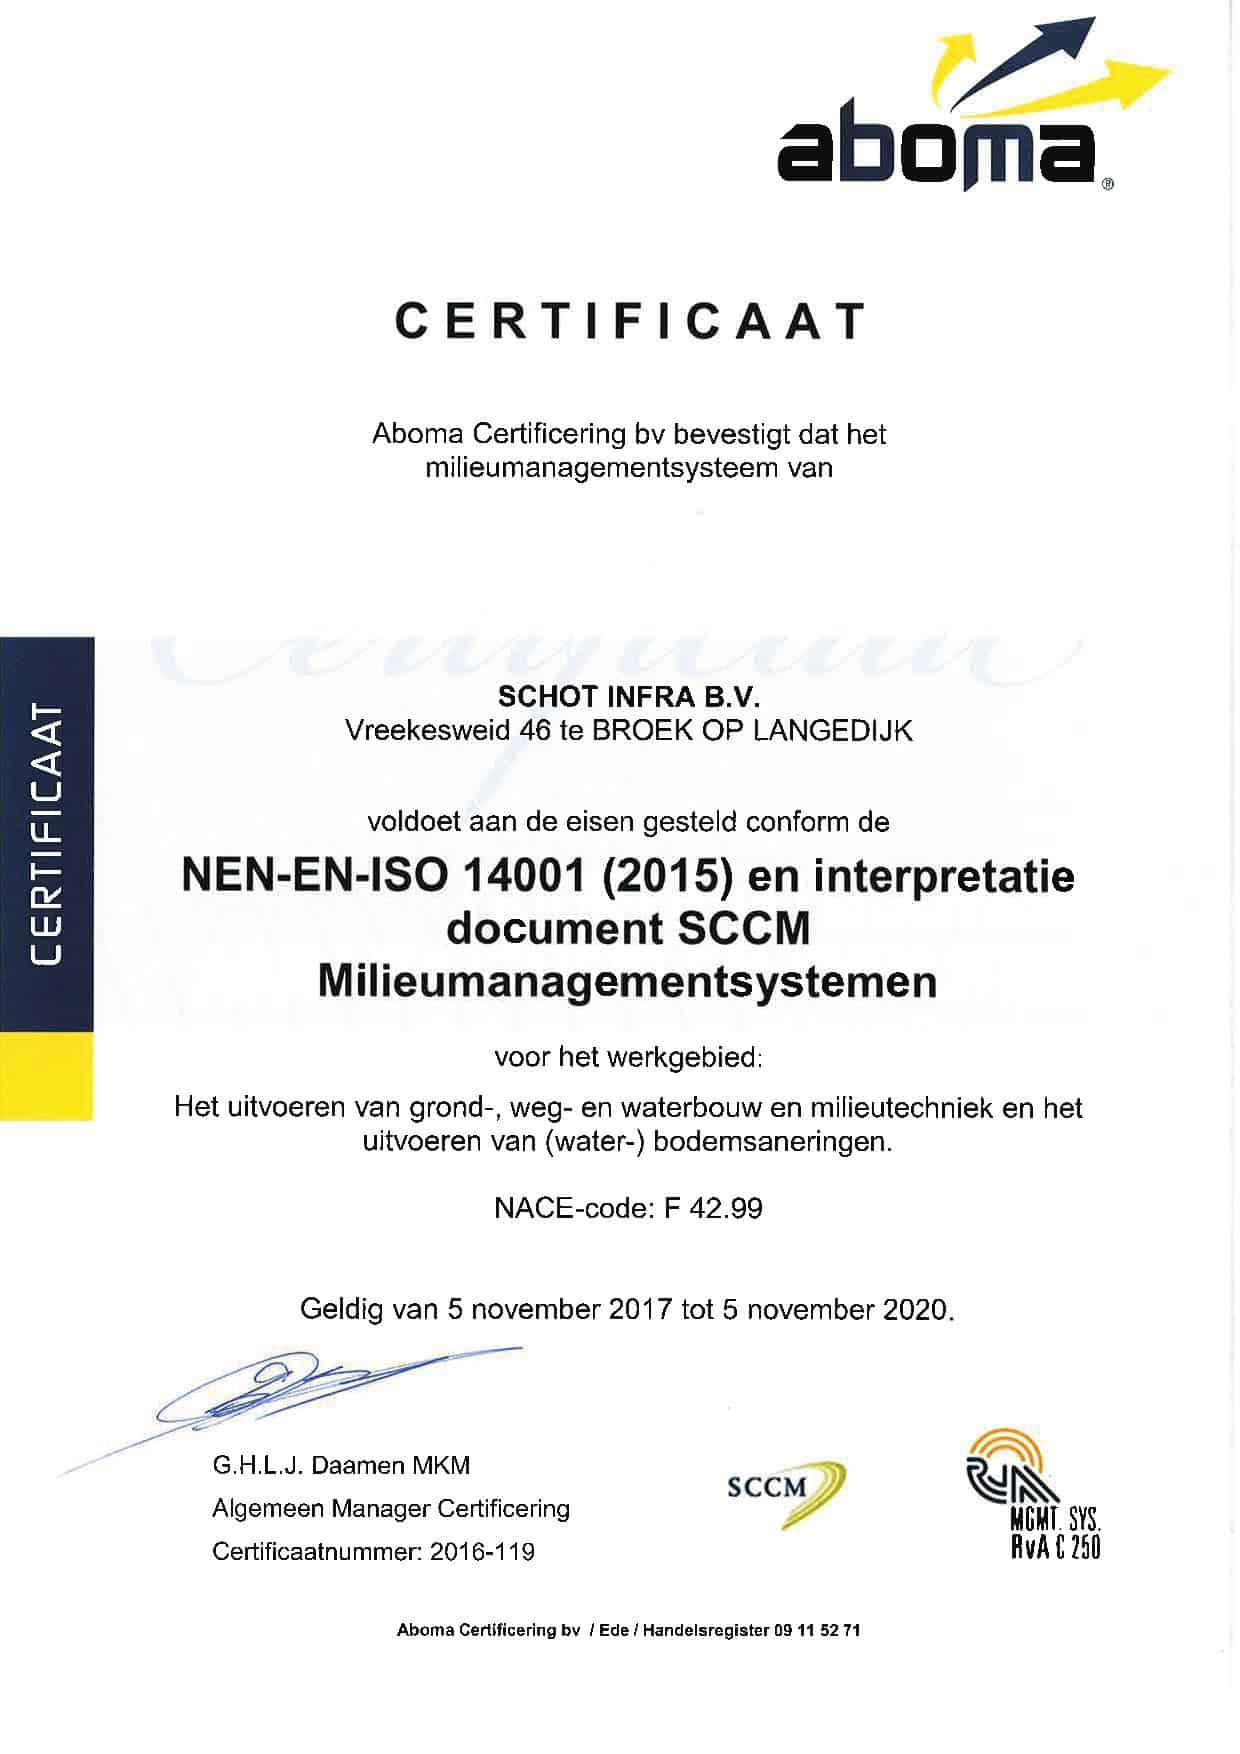 NEN-EN-ISO 14001 tot 05-11-2020